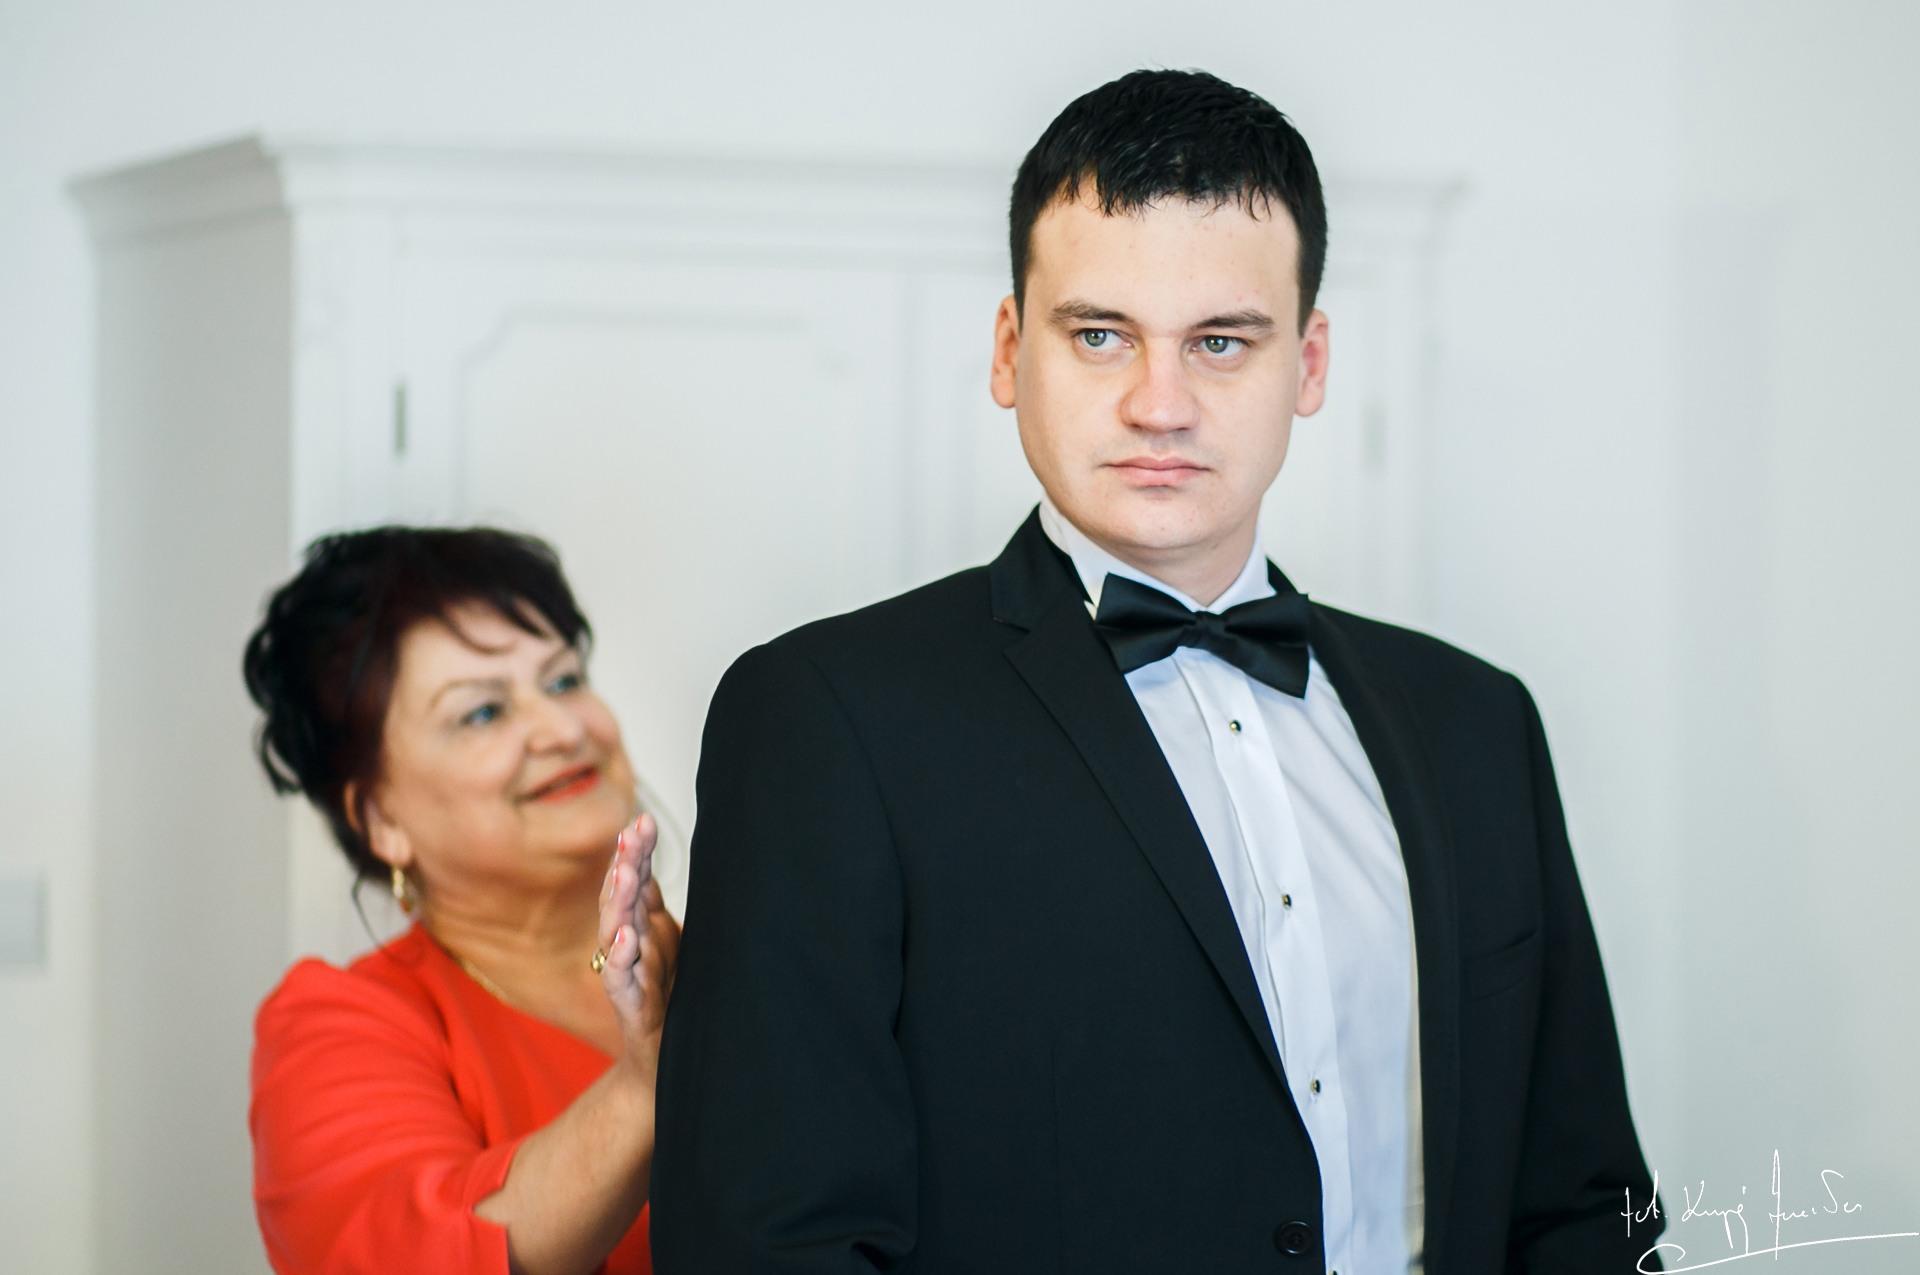 Jawor 20 Lidia & Piotr